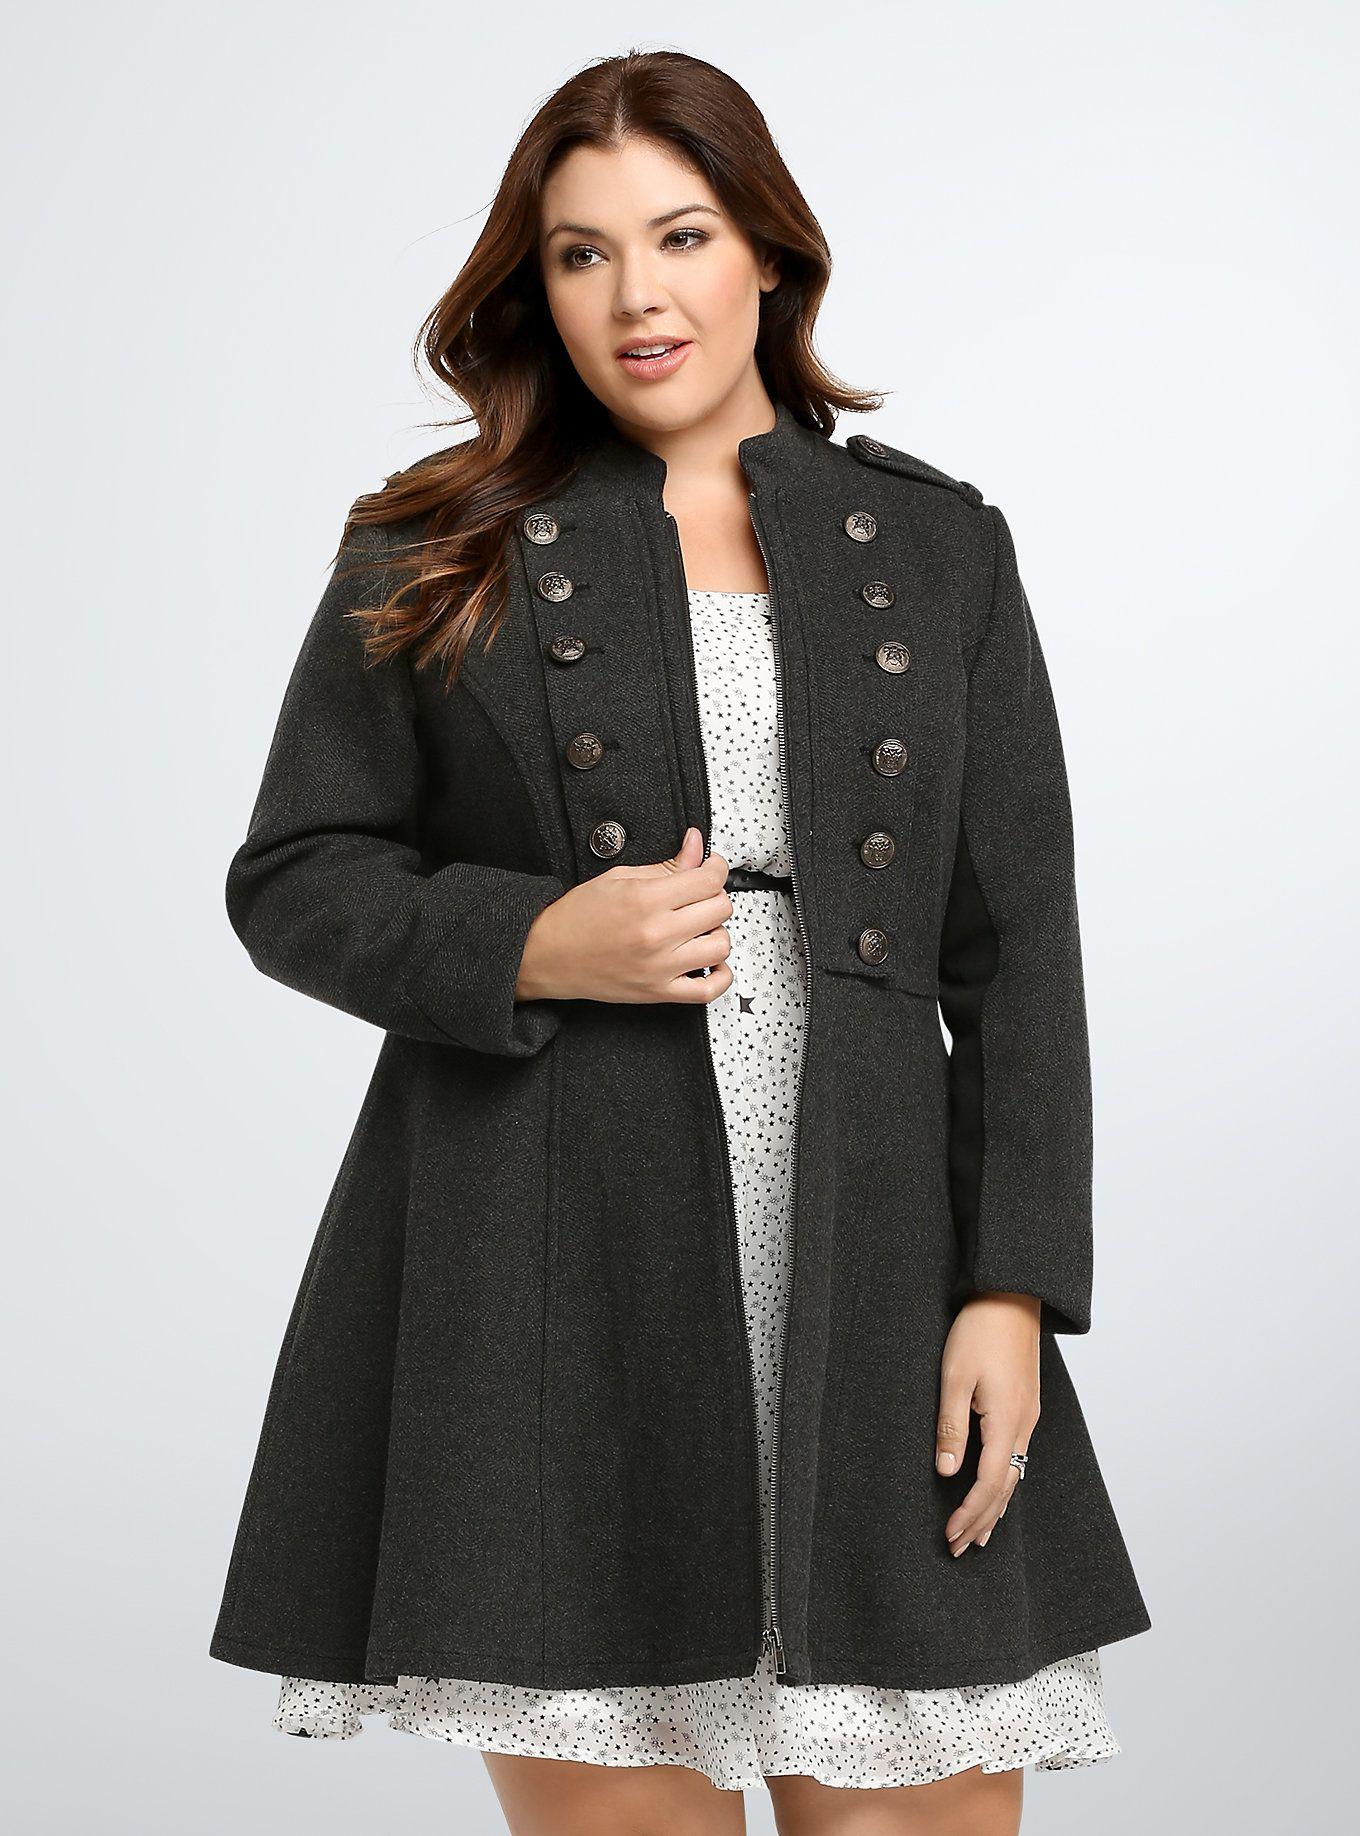 Long Military Coat | Outfits | Plus size coats, Coat, Plus size outfits